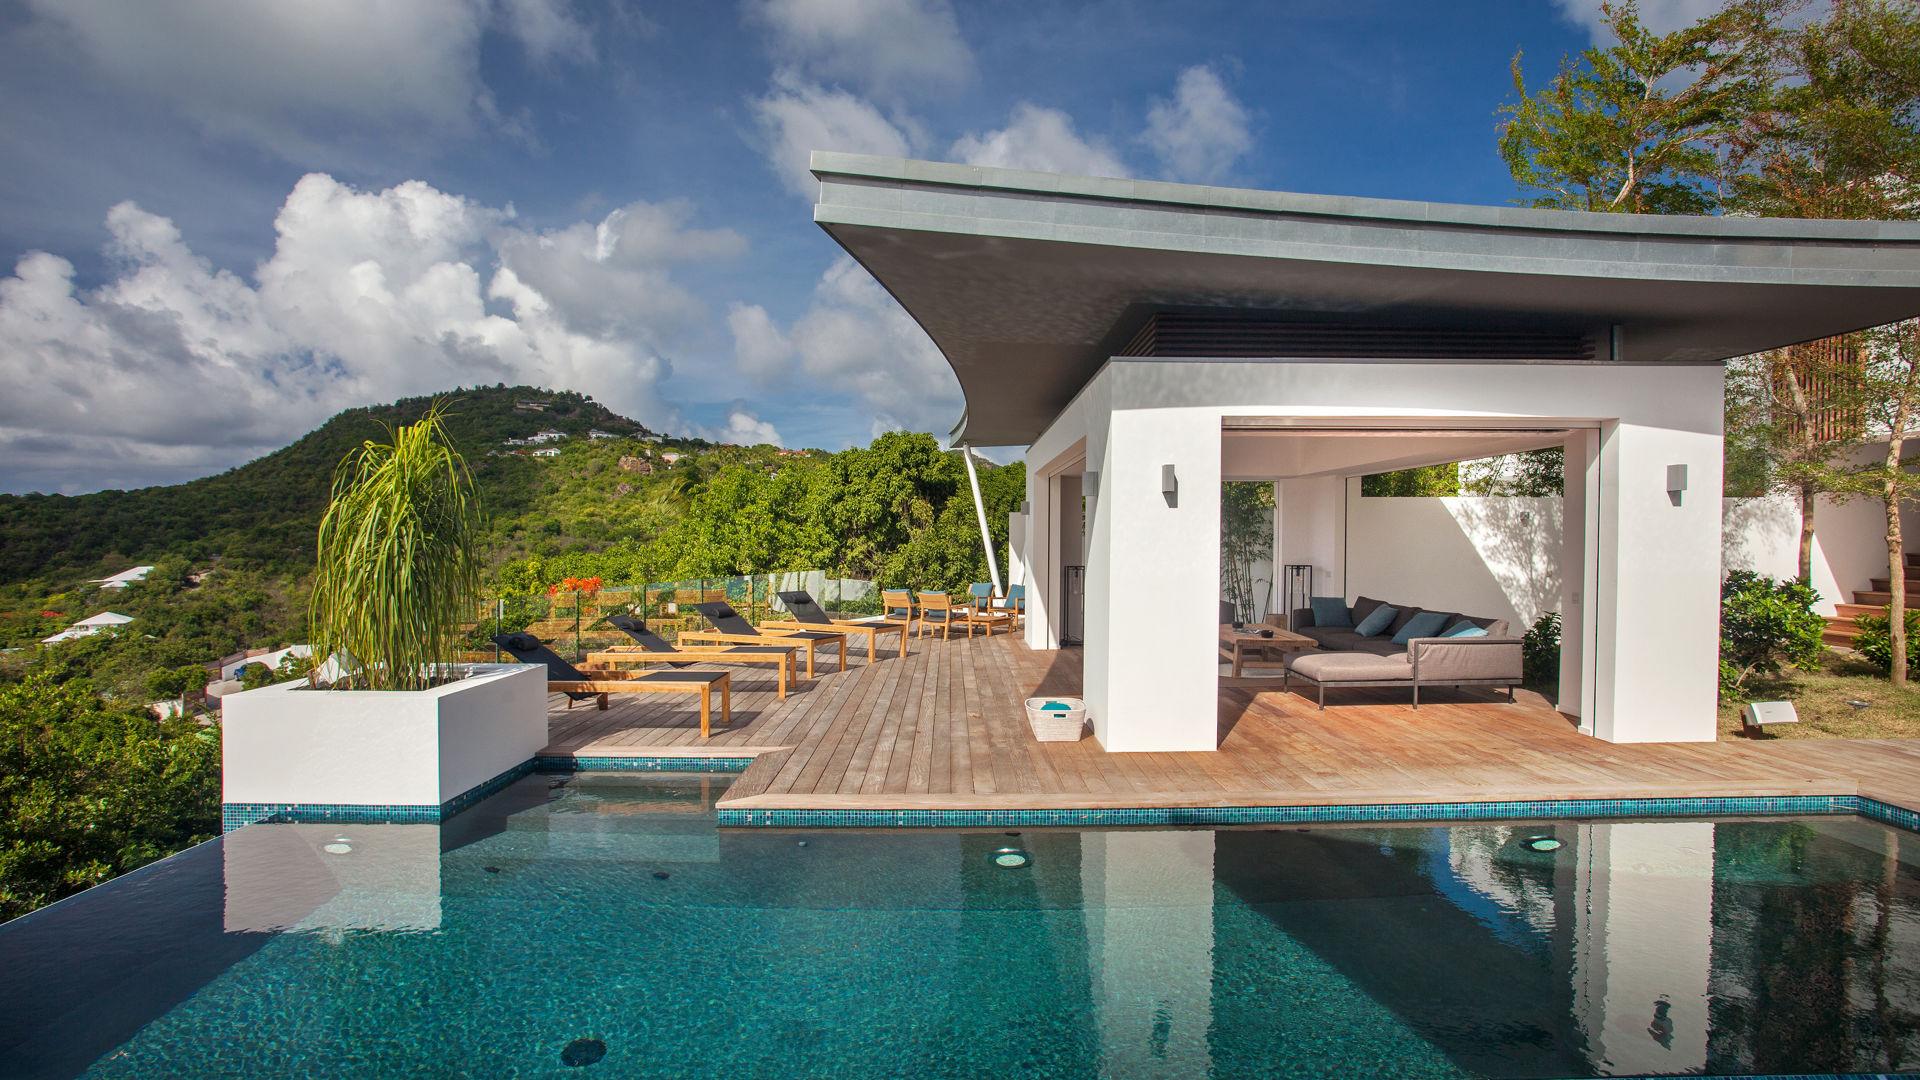 Luxury villa rentals caribbean - St barthelemy - Saint jean - No location 4 - Wings - Image 1/31